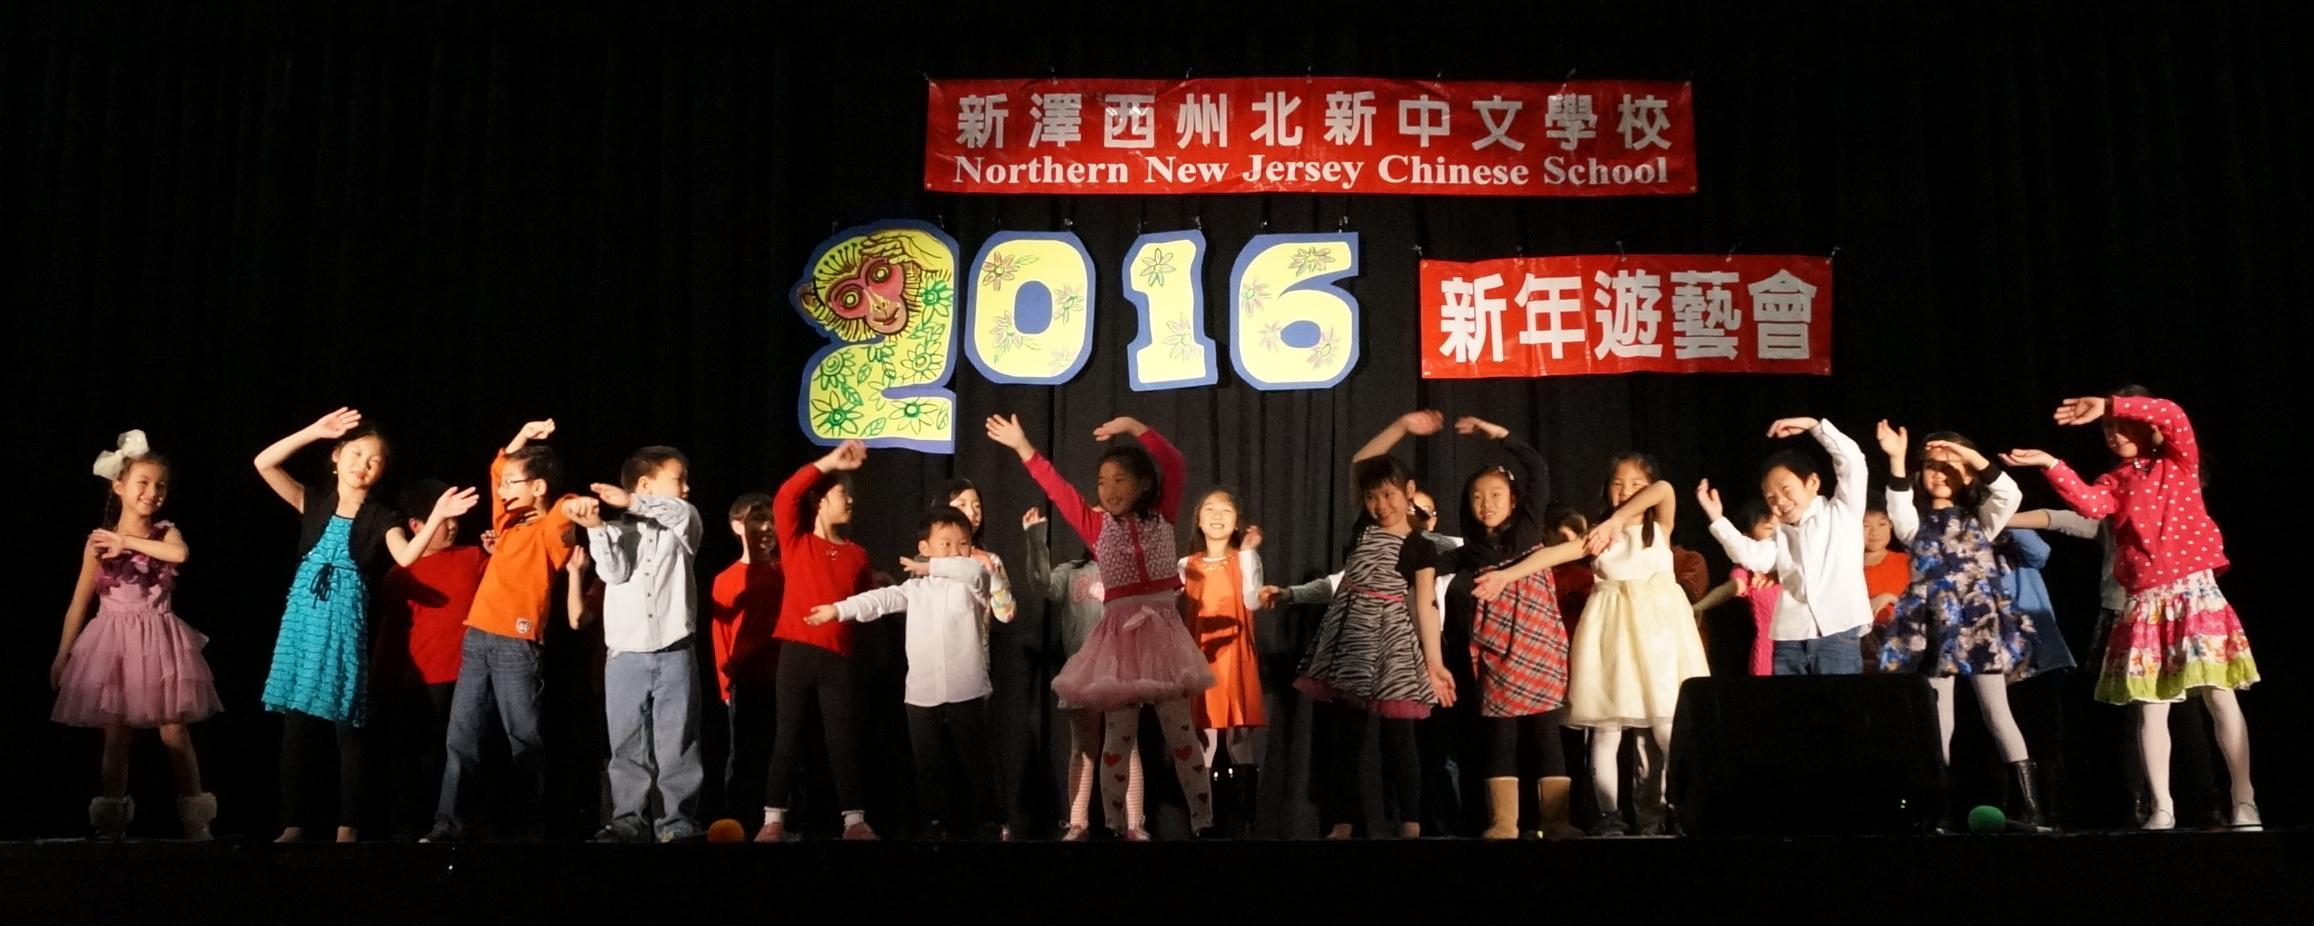 c1fef5803ad48eb0b31e_aaa_Chinese_New_Year_pix_211.JPG